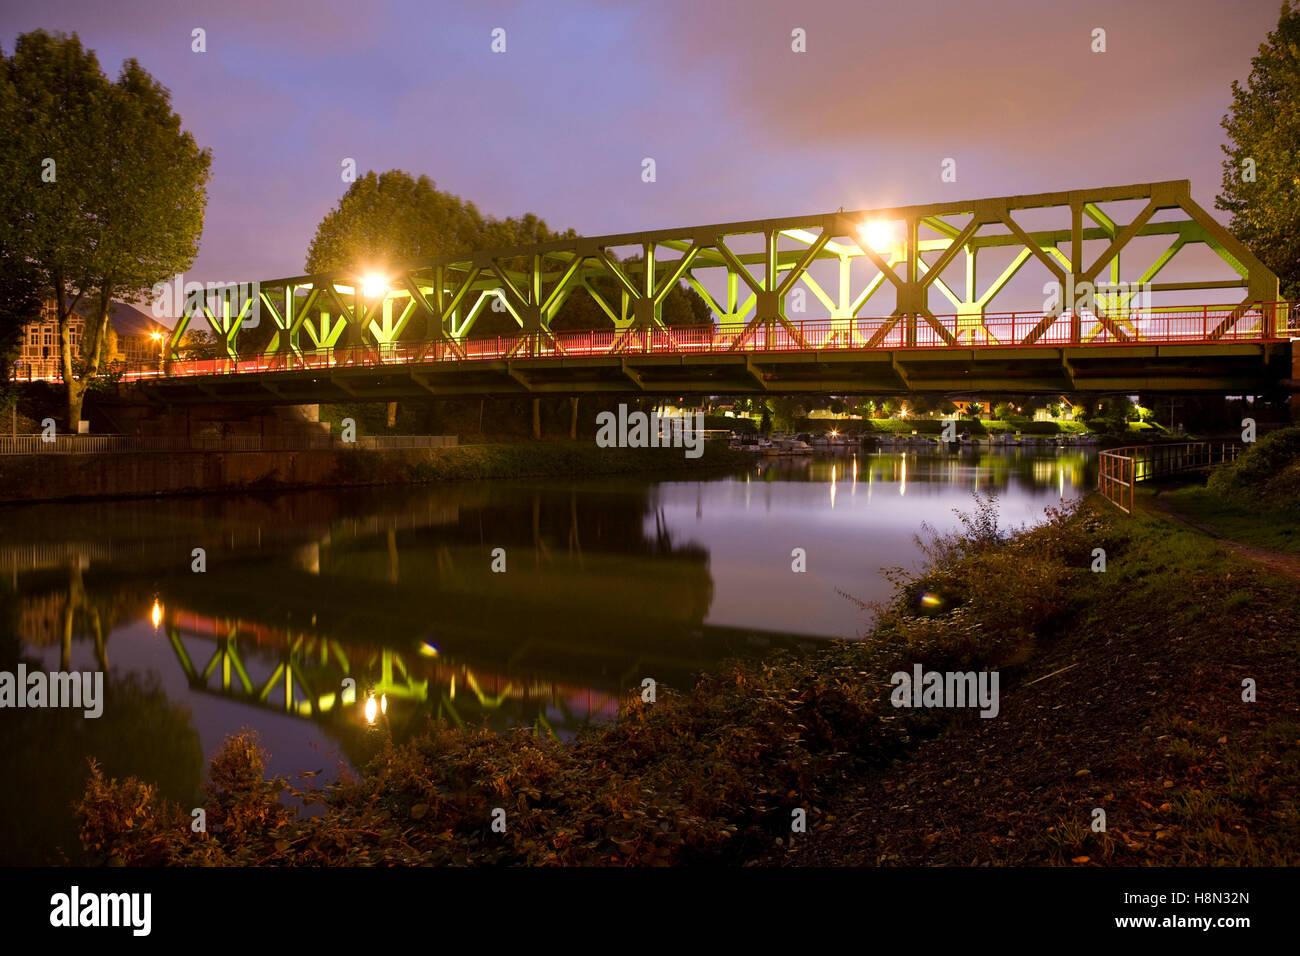 Germany,  Ruhr area, Waltrop, bridge across the Dortmund-Ems-Canal. - Stock Image